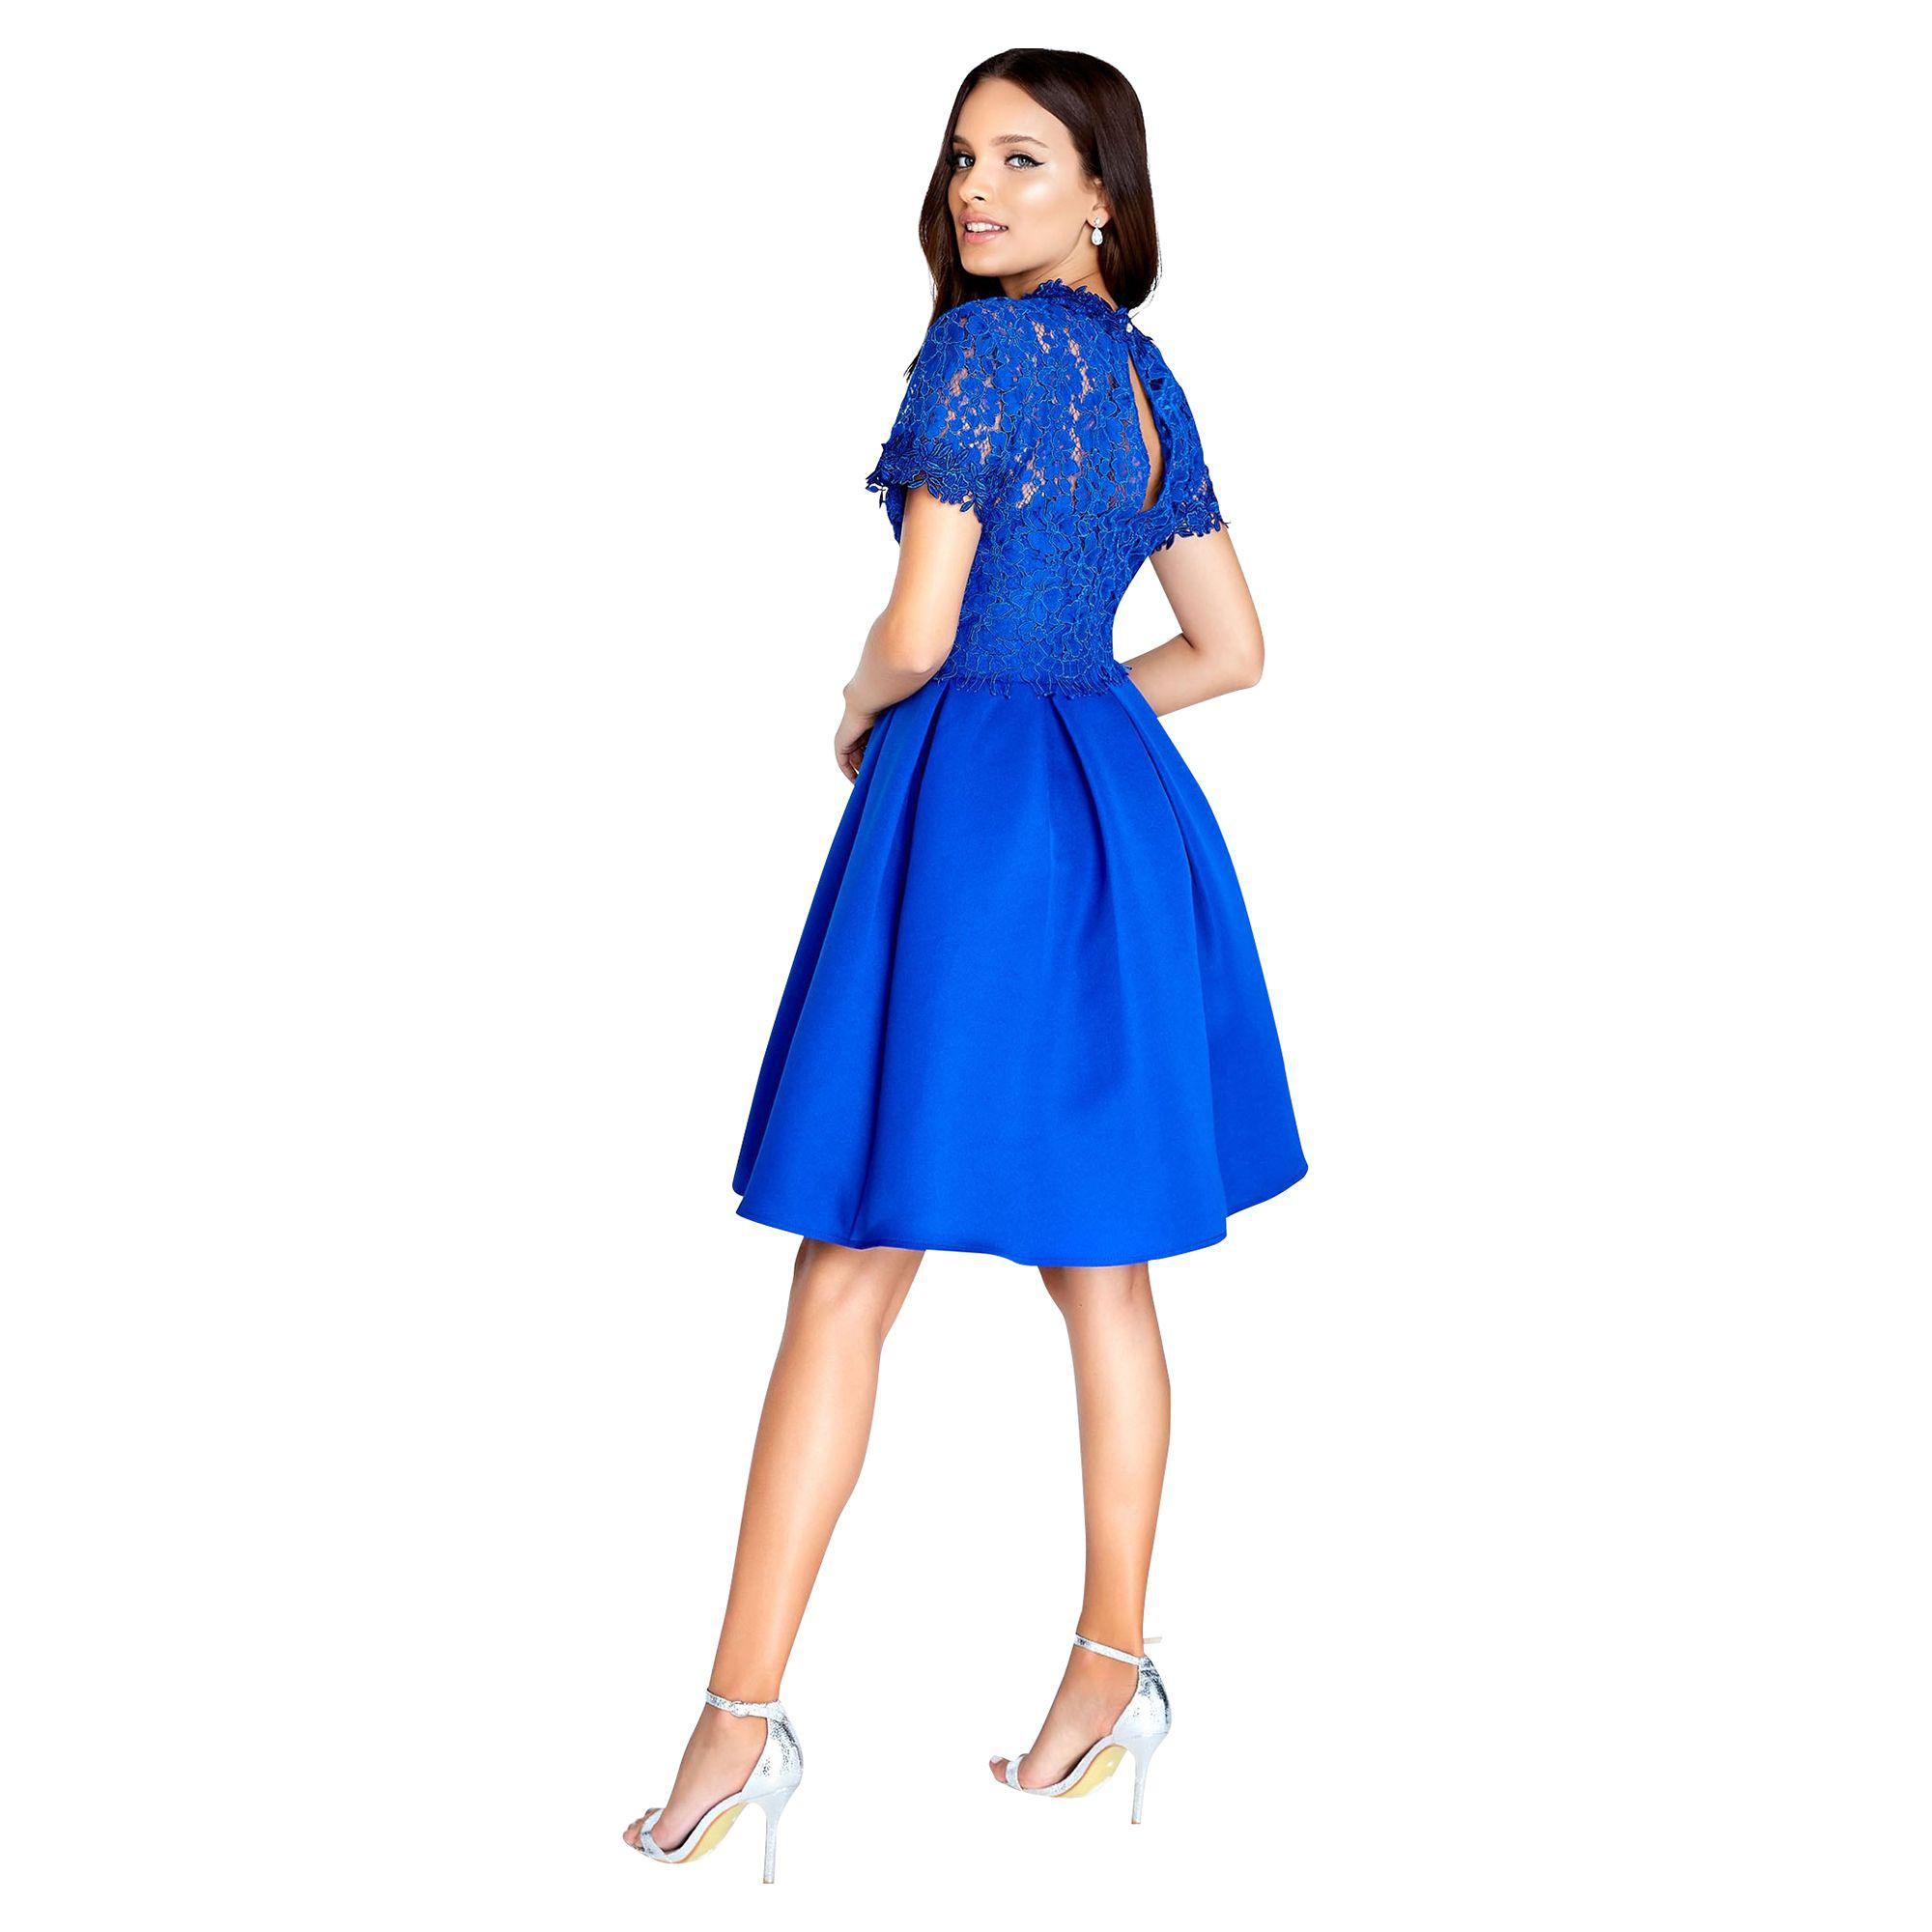 Yumi Womens Lace Skater Dress Cobalt Blue  Cut Out Floral Dress UK 14 RRP £65